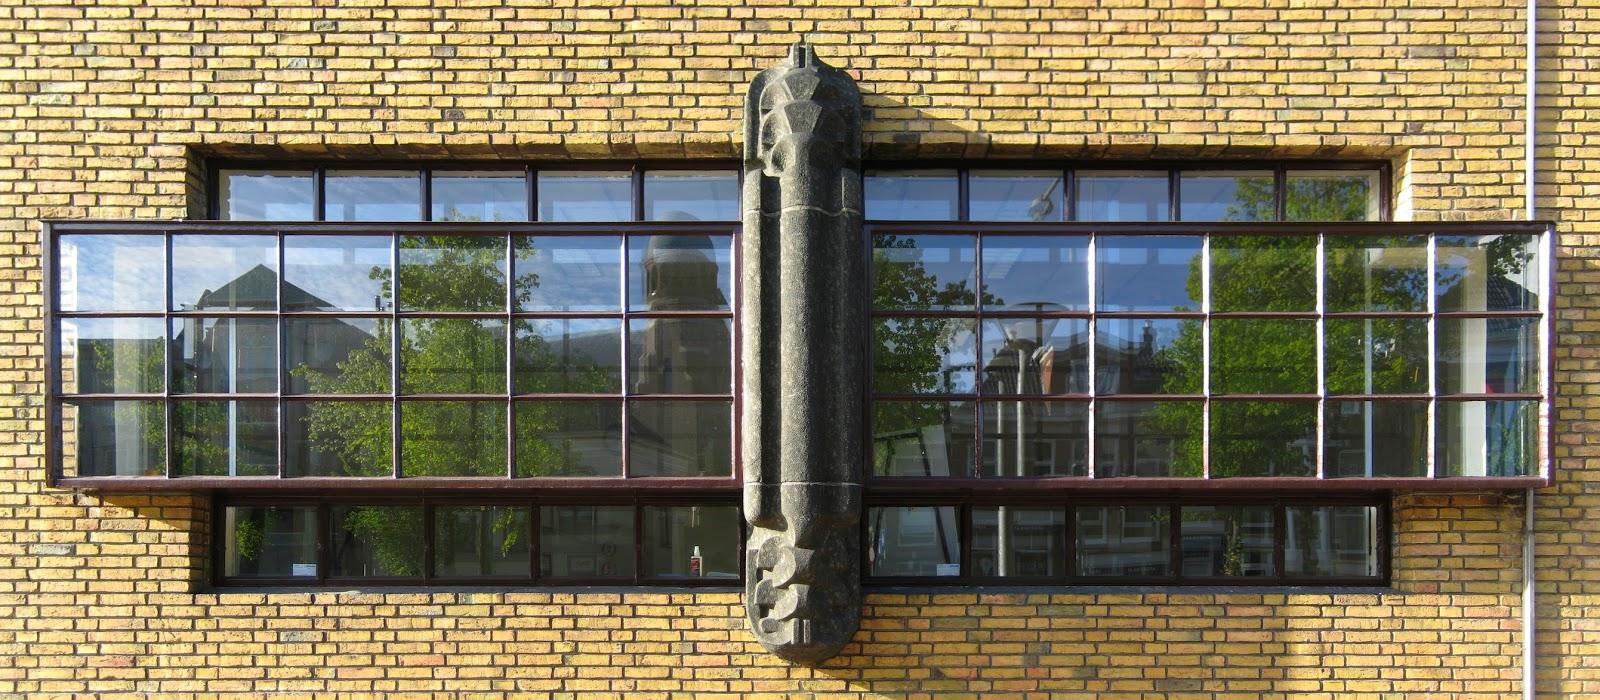 Architecten provincie groningen: siebe jan bouma 1899  1959